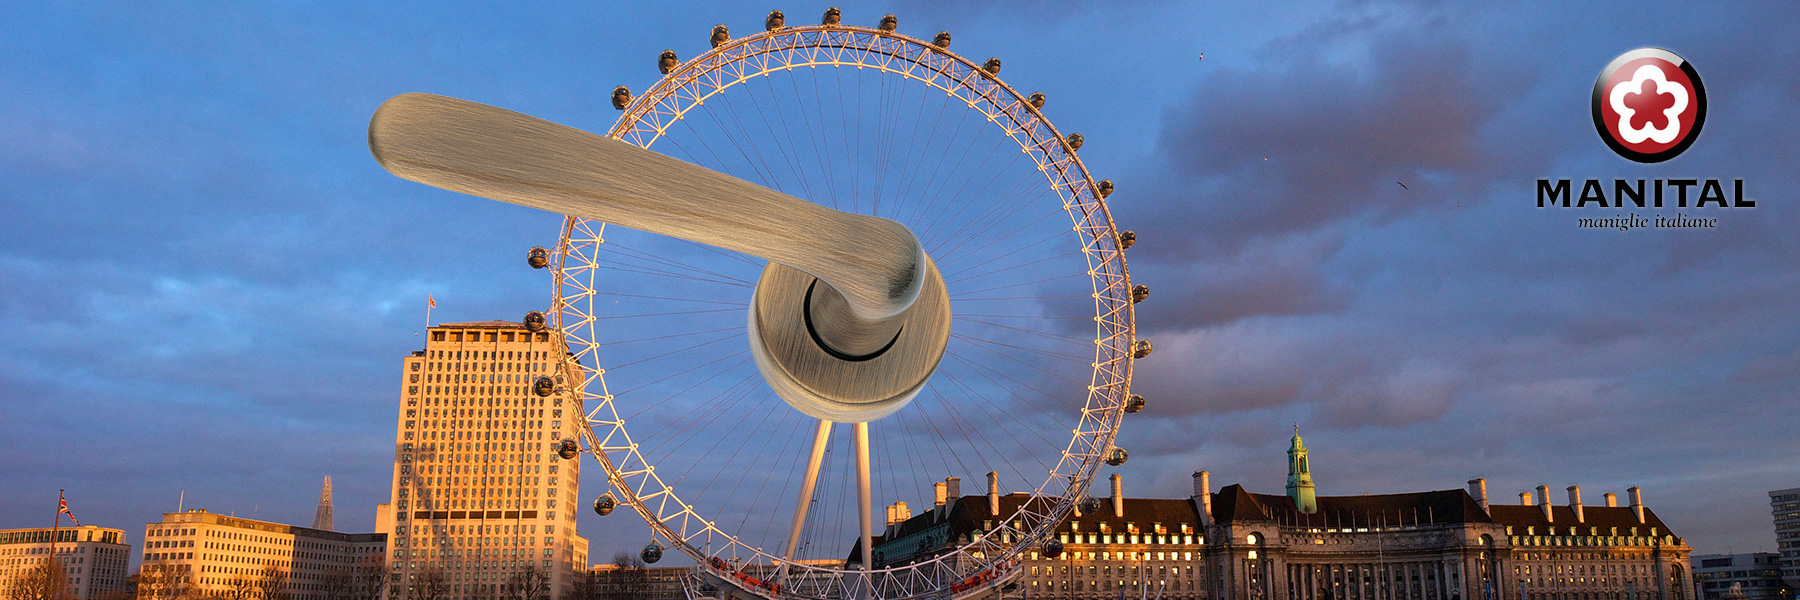 London-Eye-Manital-2